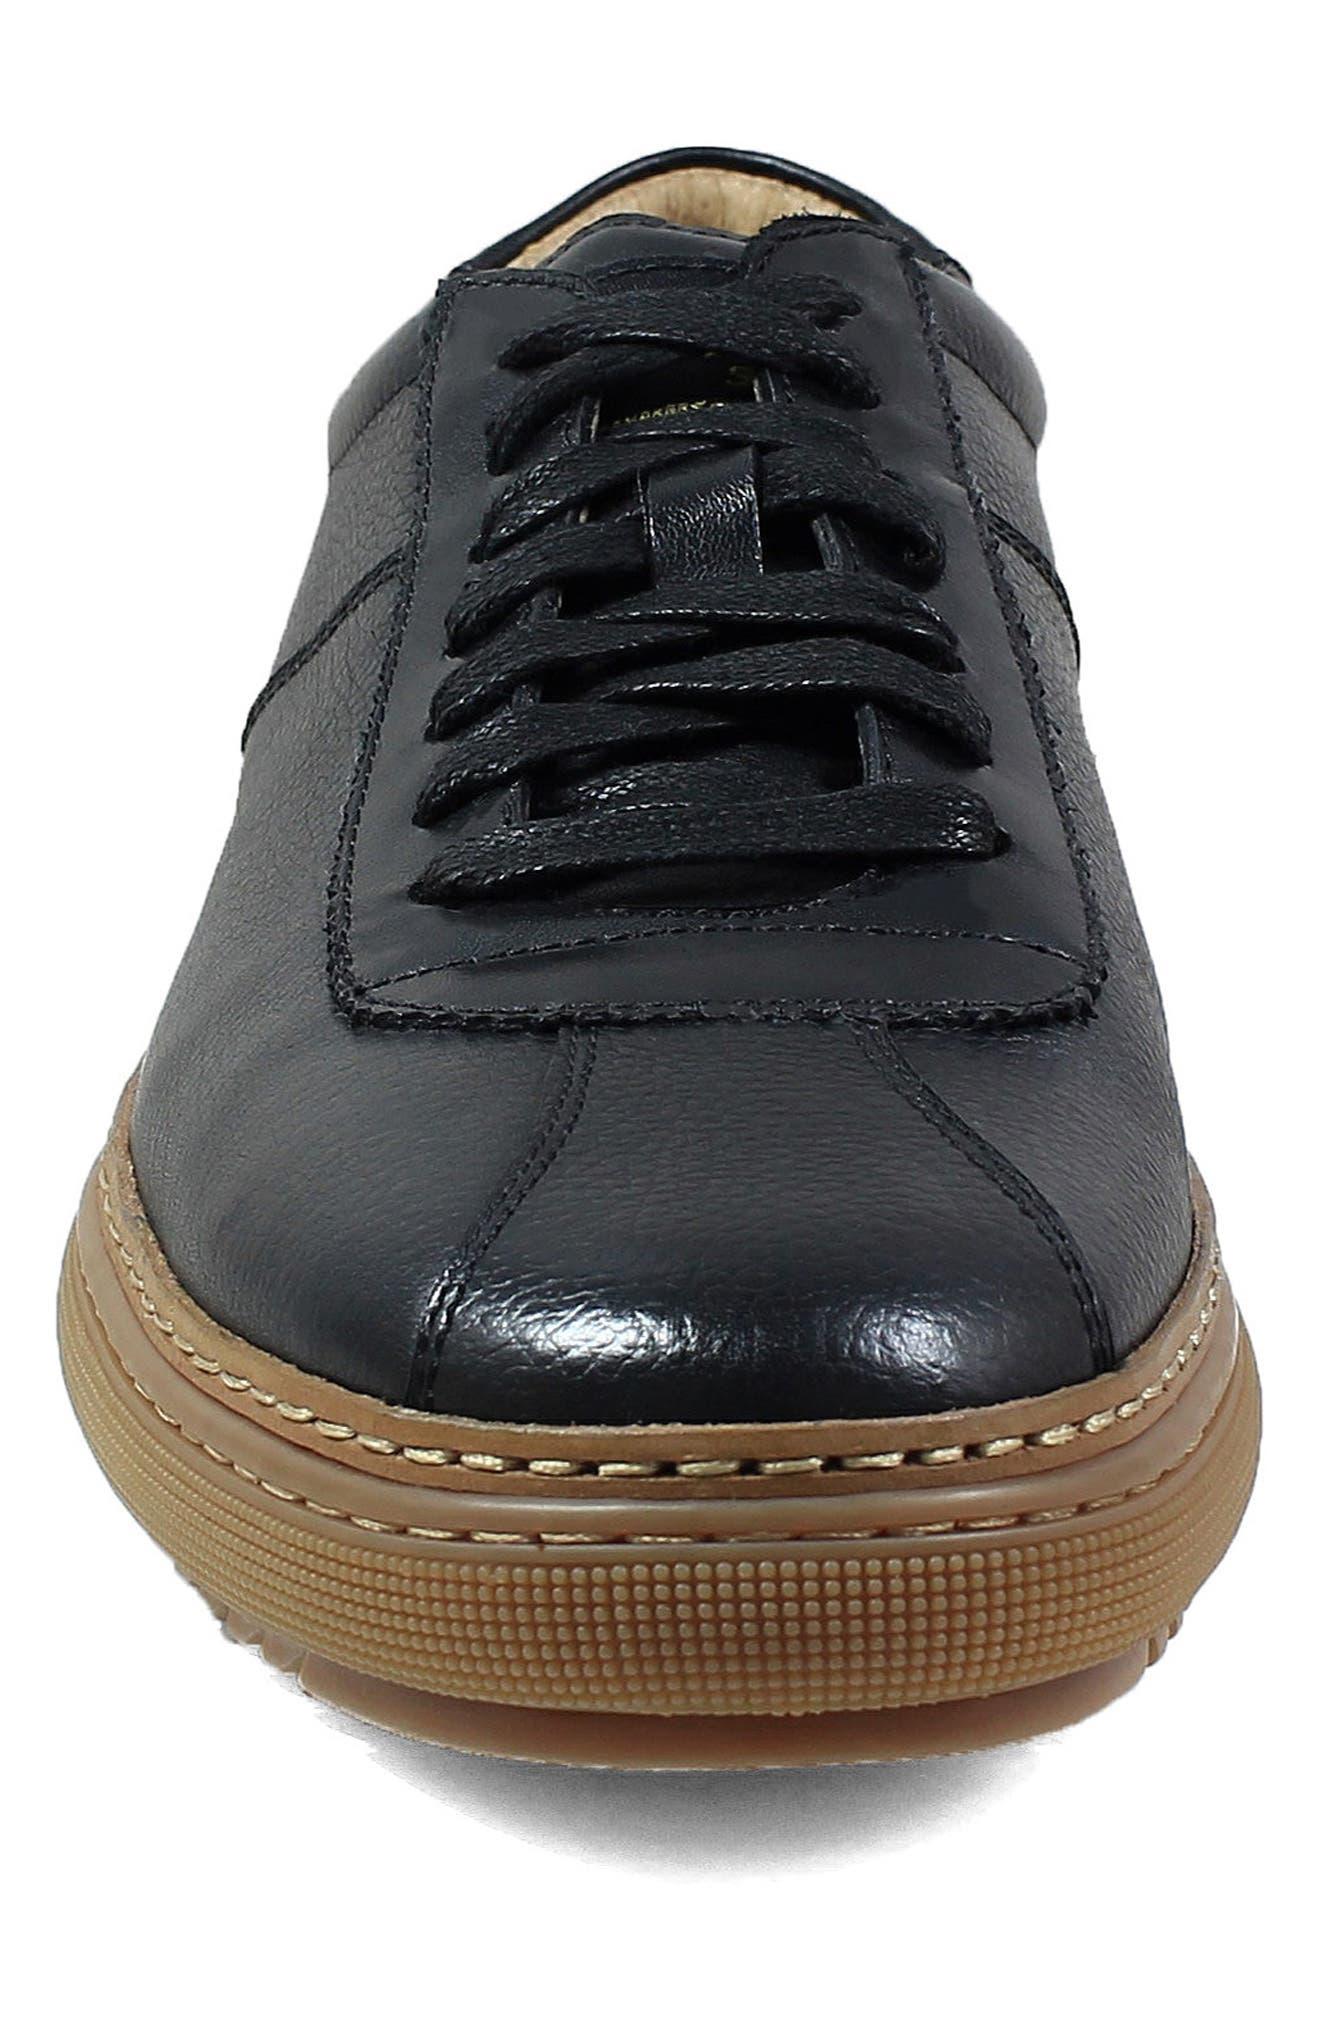 Crew Sneaker,                             Alternate thumbnail 4, color,                             001